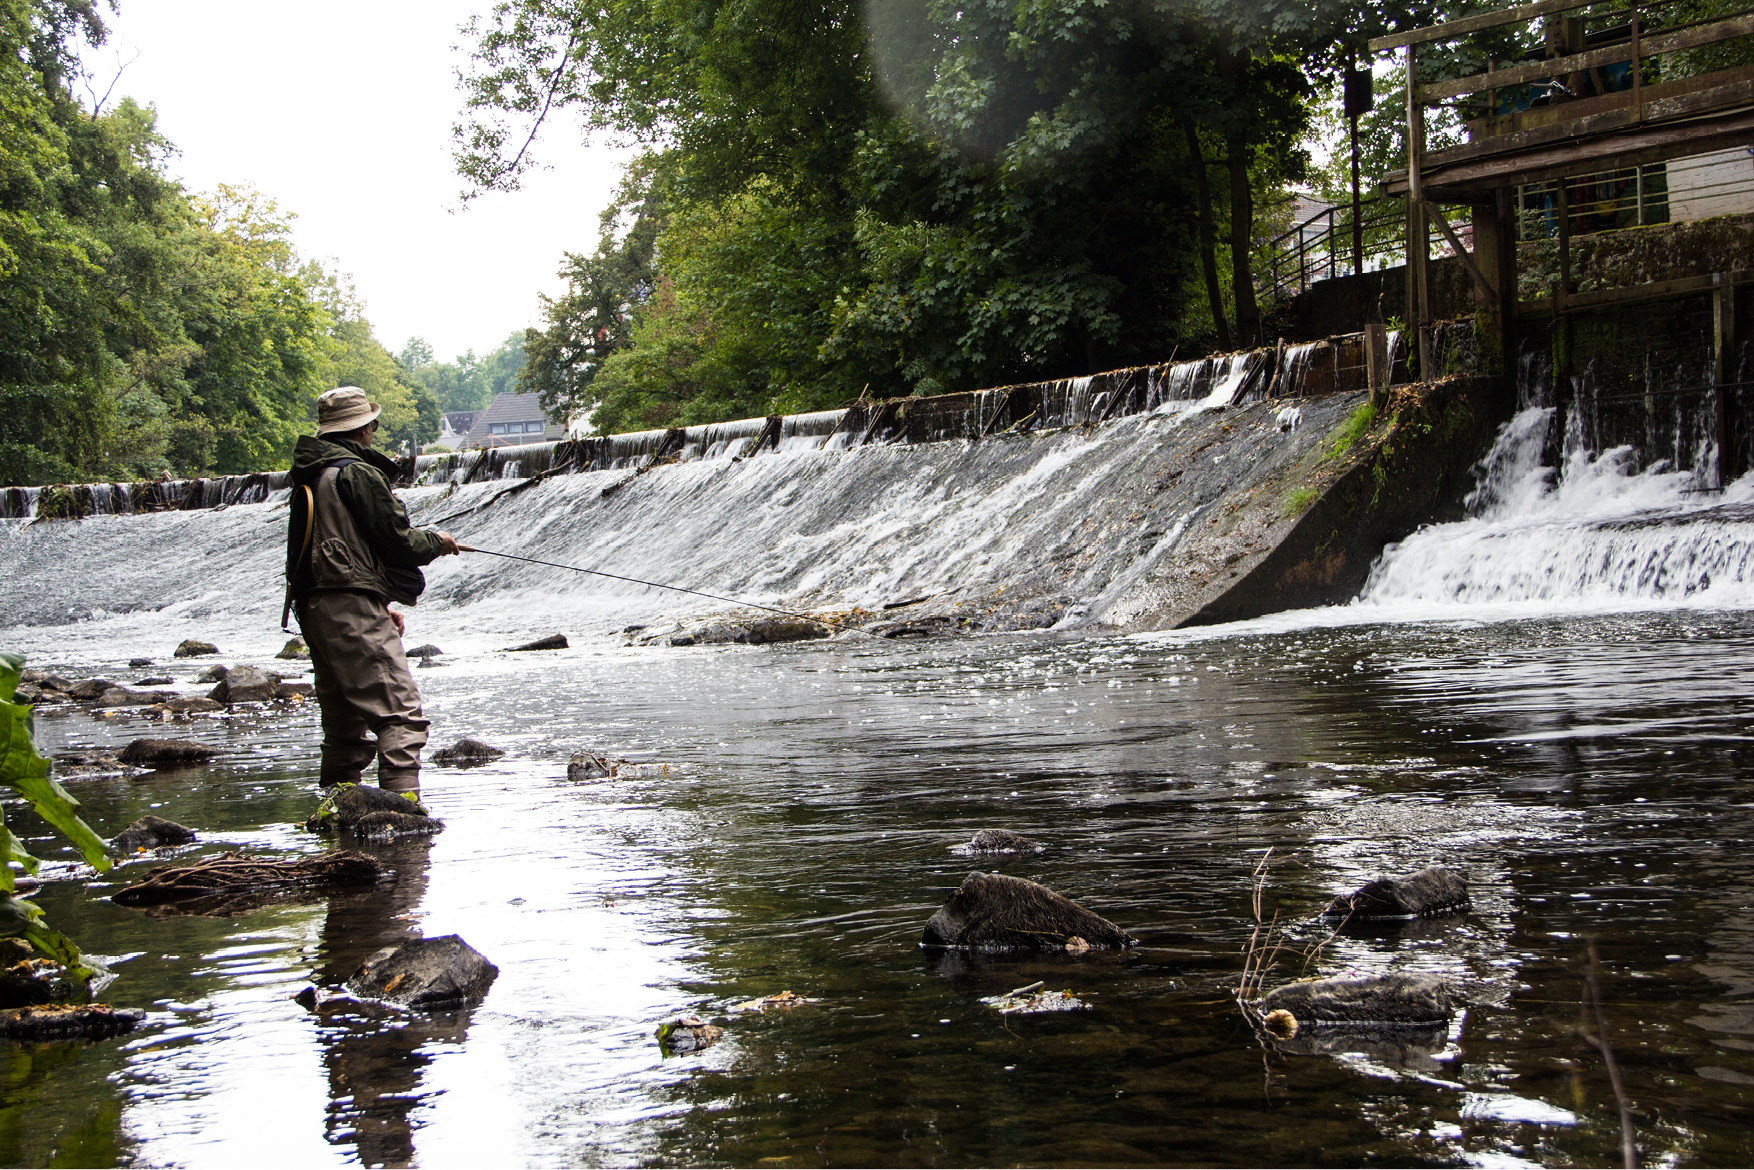 Forelle Äsche Fliegenfischen Urft Brückencast Tankred Gumpen